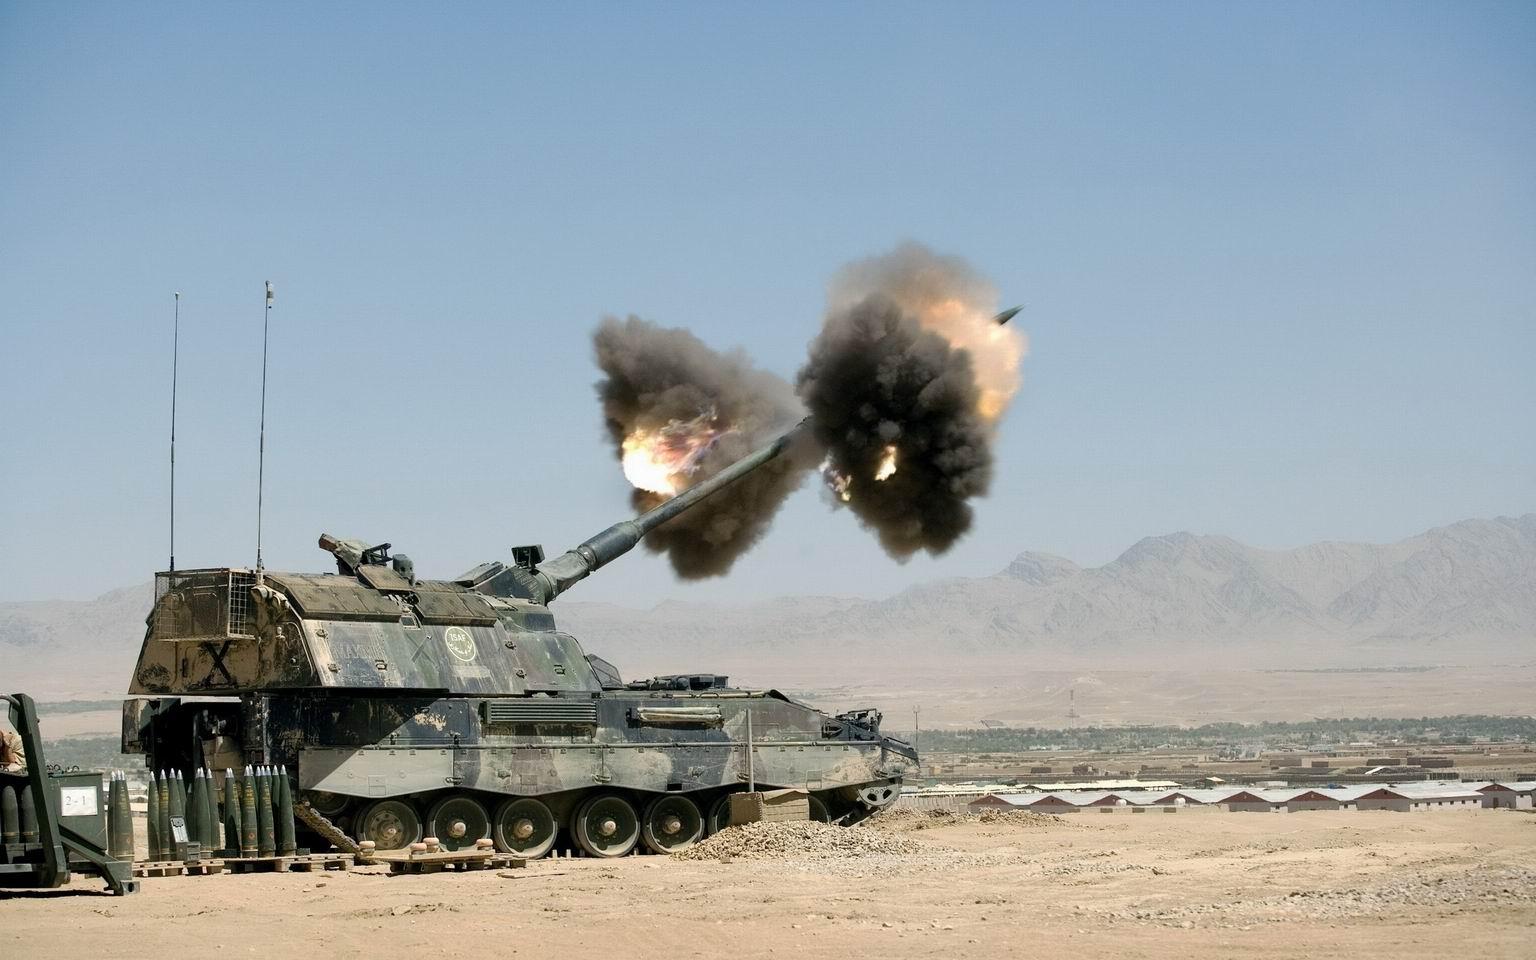 Самоходная артиллерийская установка 2С35 «Коалиция-СВ»